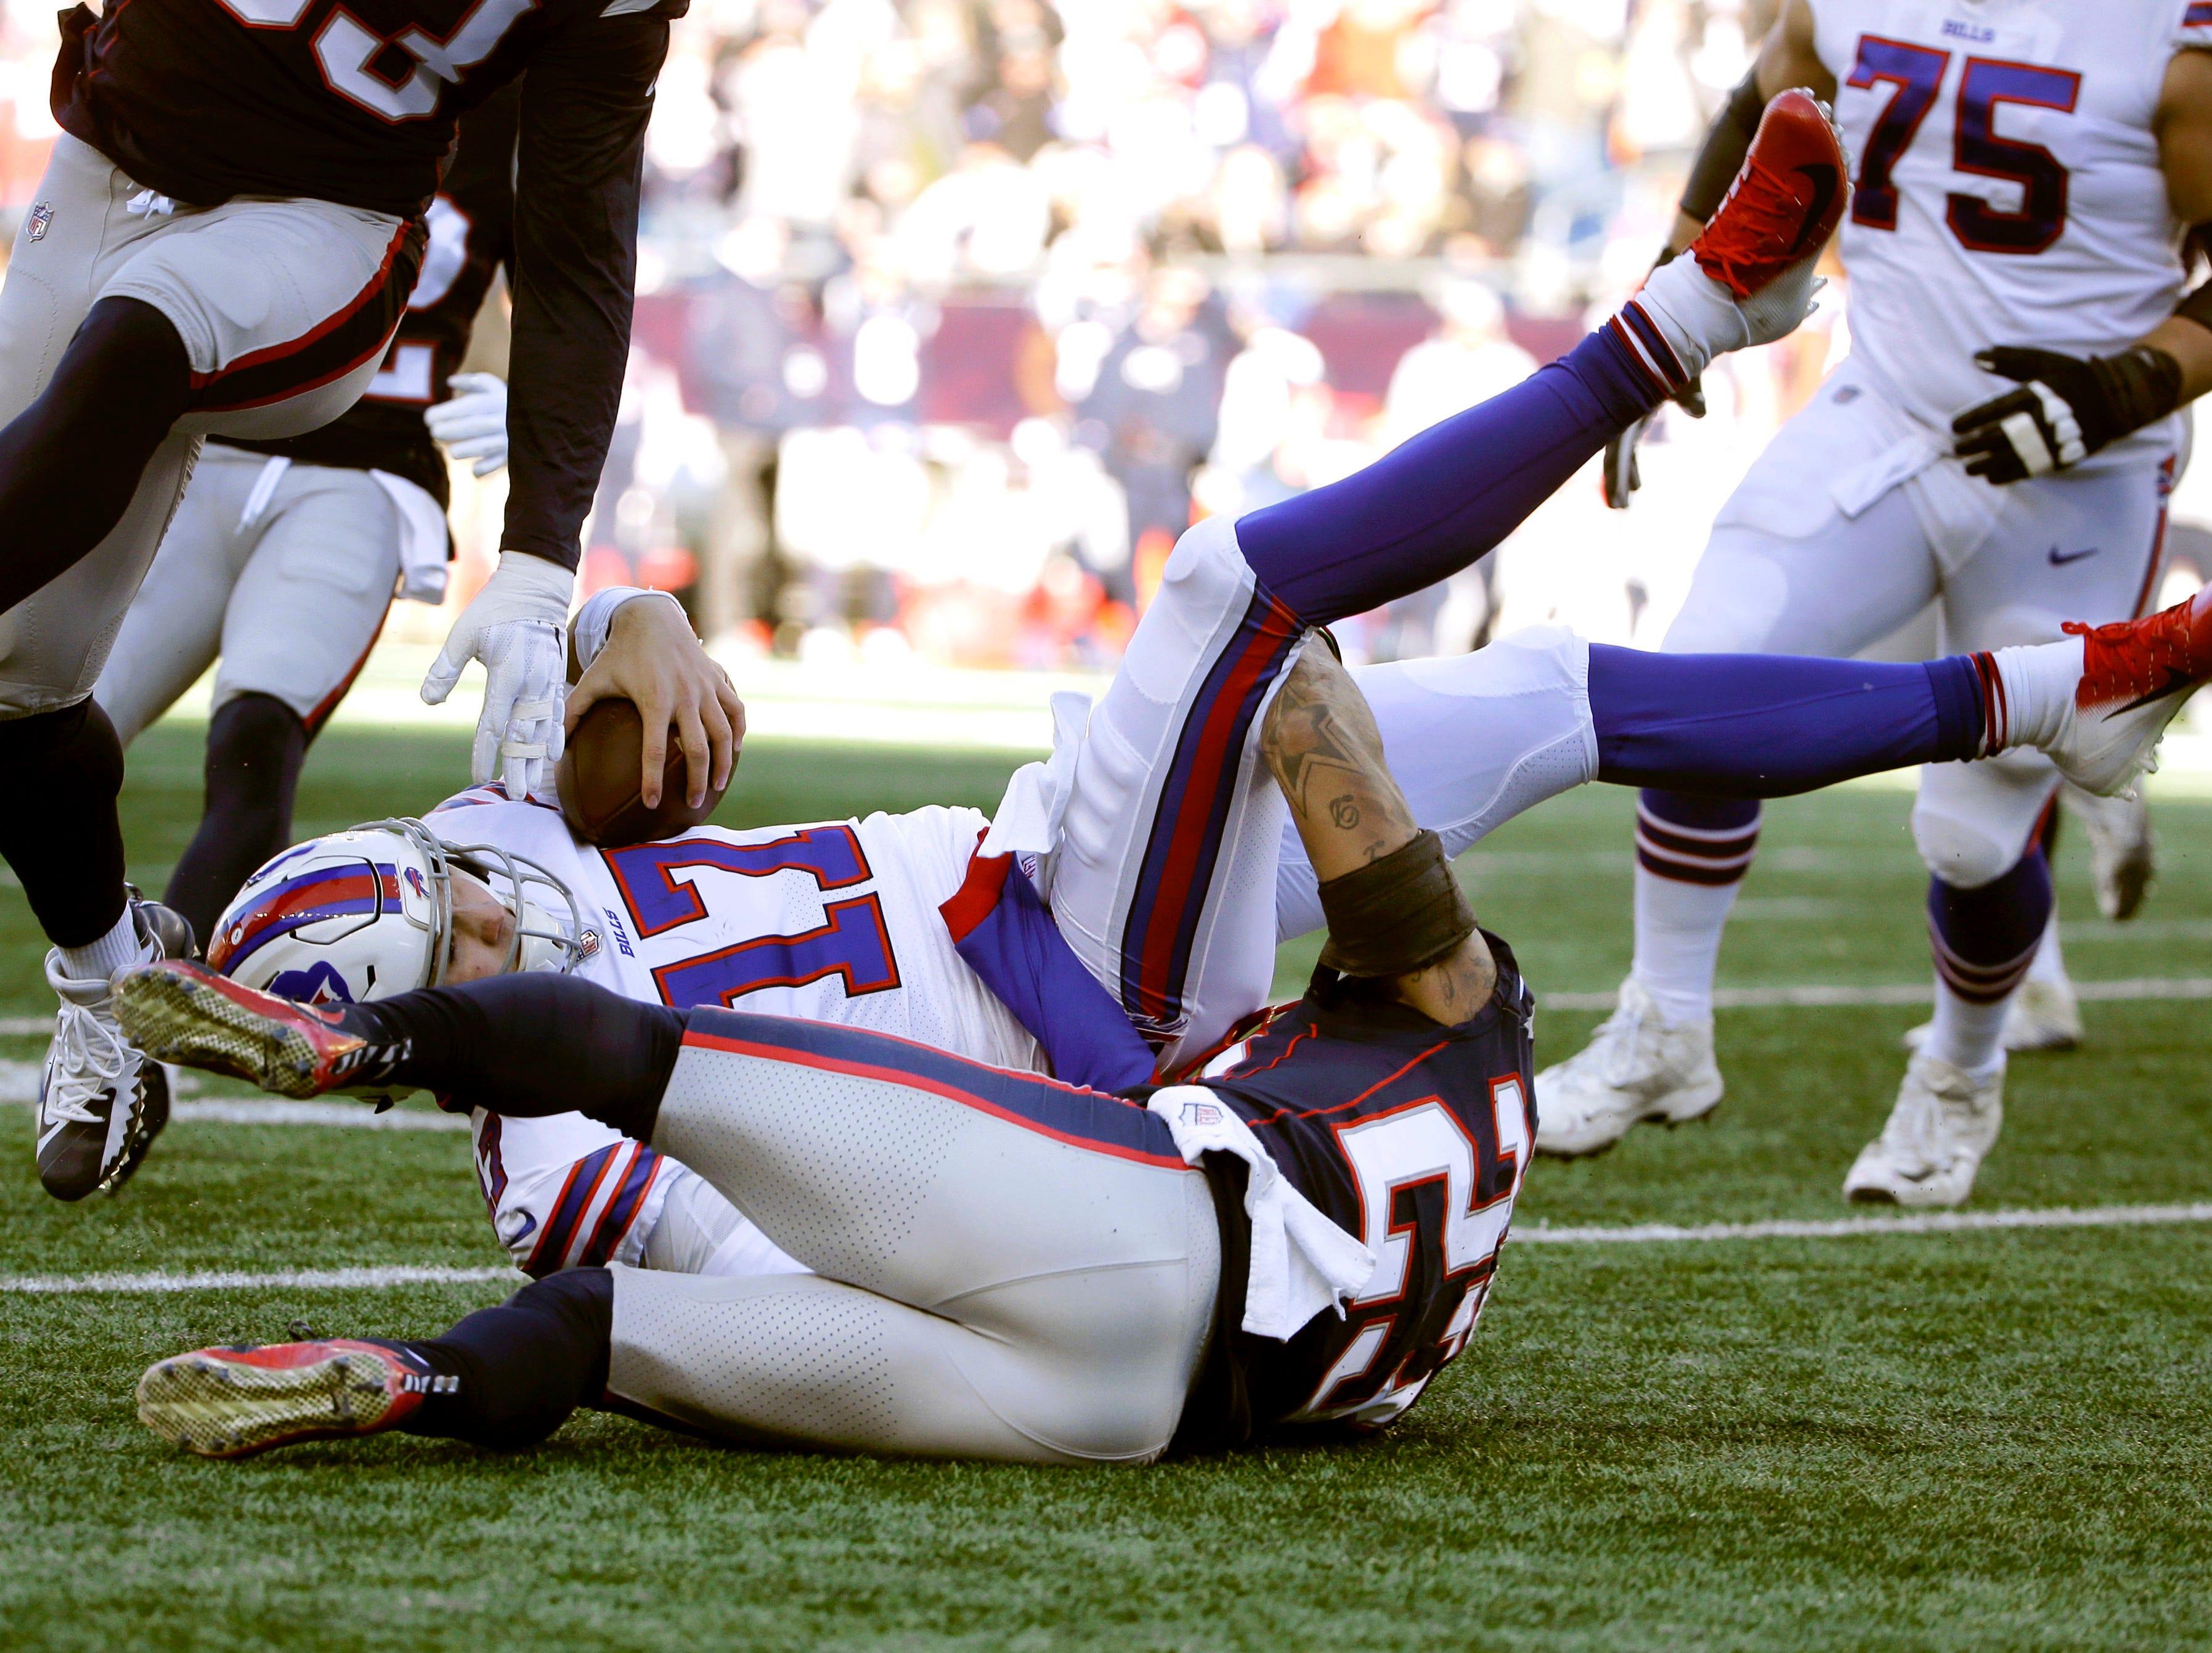 New England Patriots defensive back Patrick Chung, bottom, tackles Buffalo Bills quarterback Josh Allen during the first half of an NFL football game, Sunday, Dec. 23, 2018, in Foxborough, Mass. (AP Photo/Steven Senne)